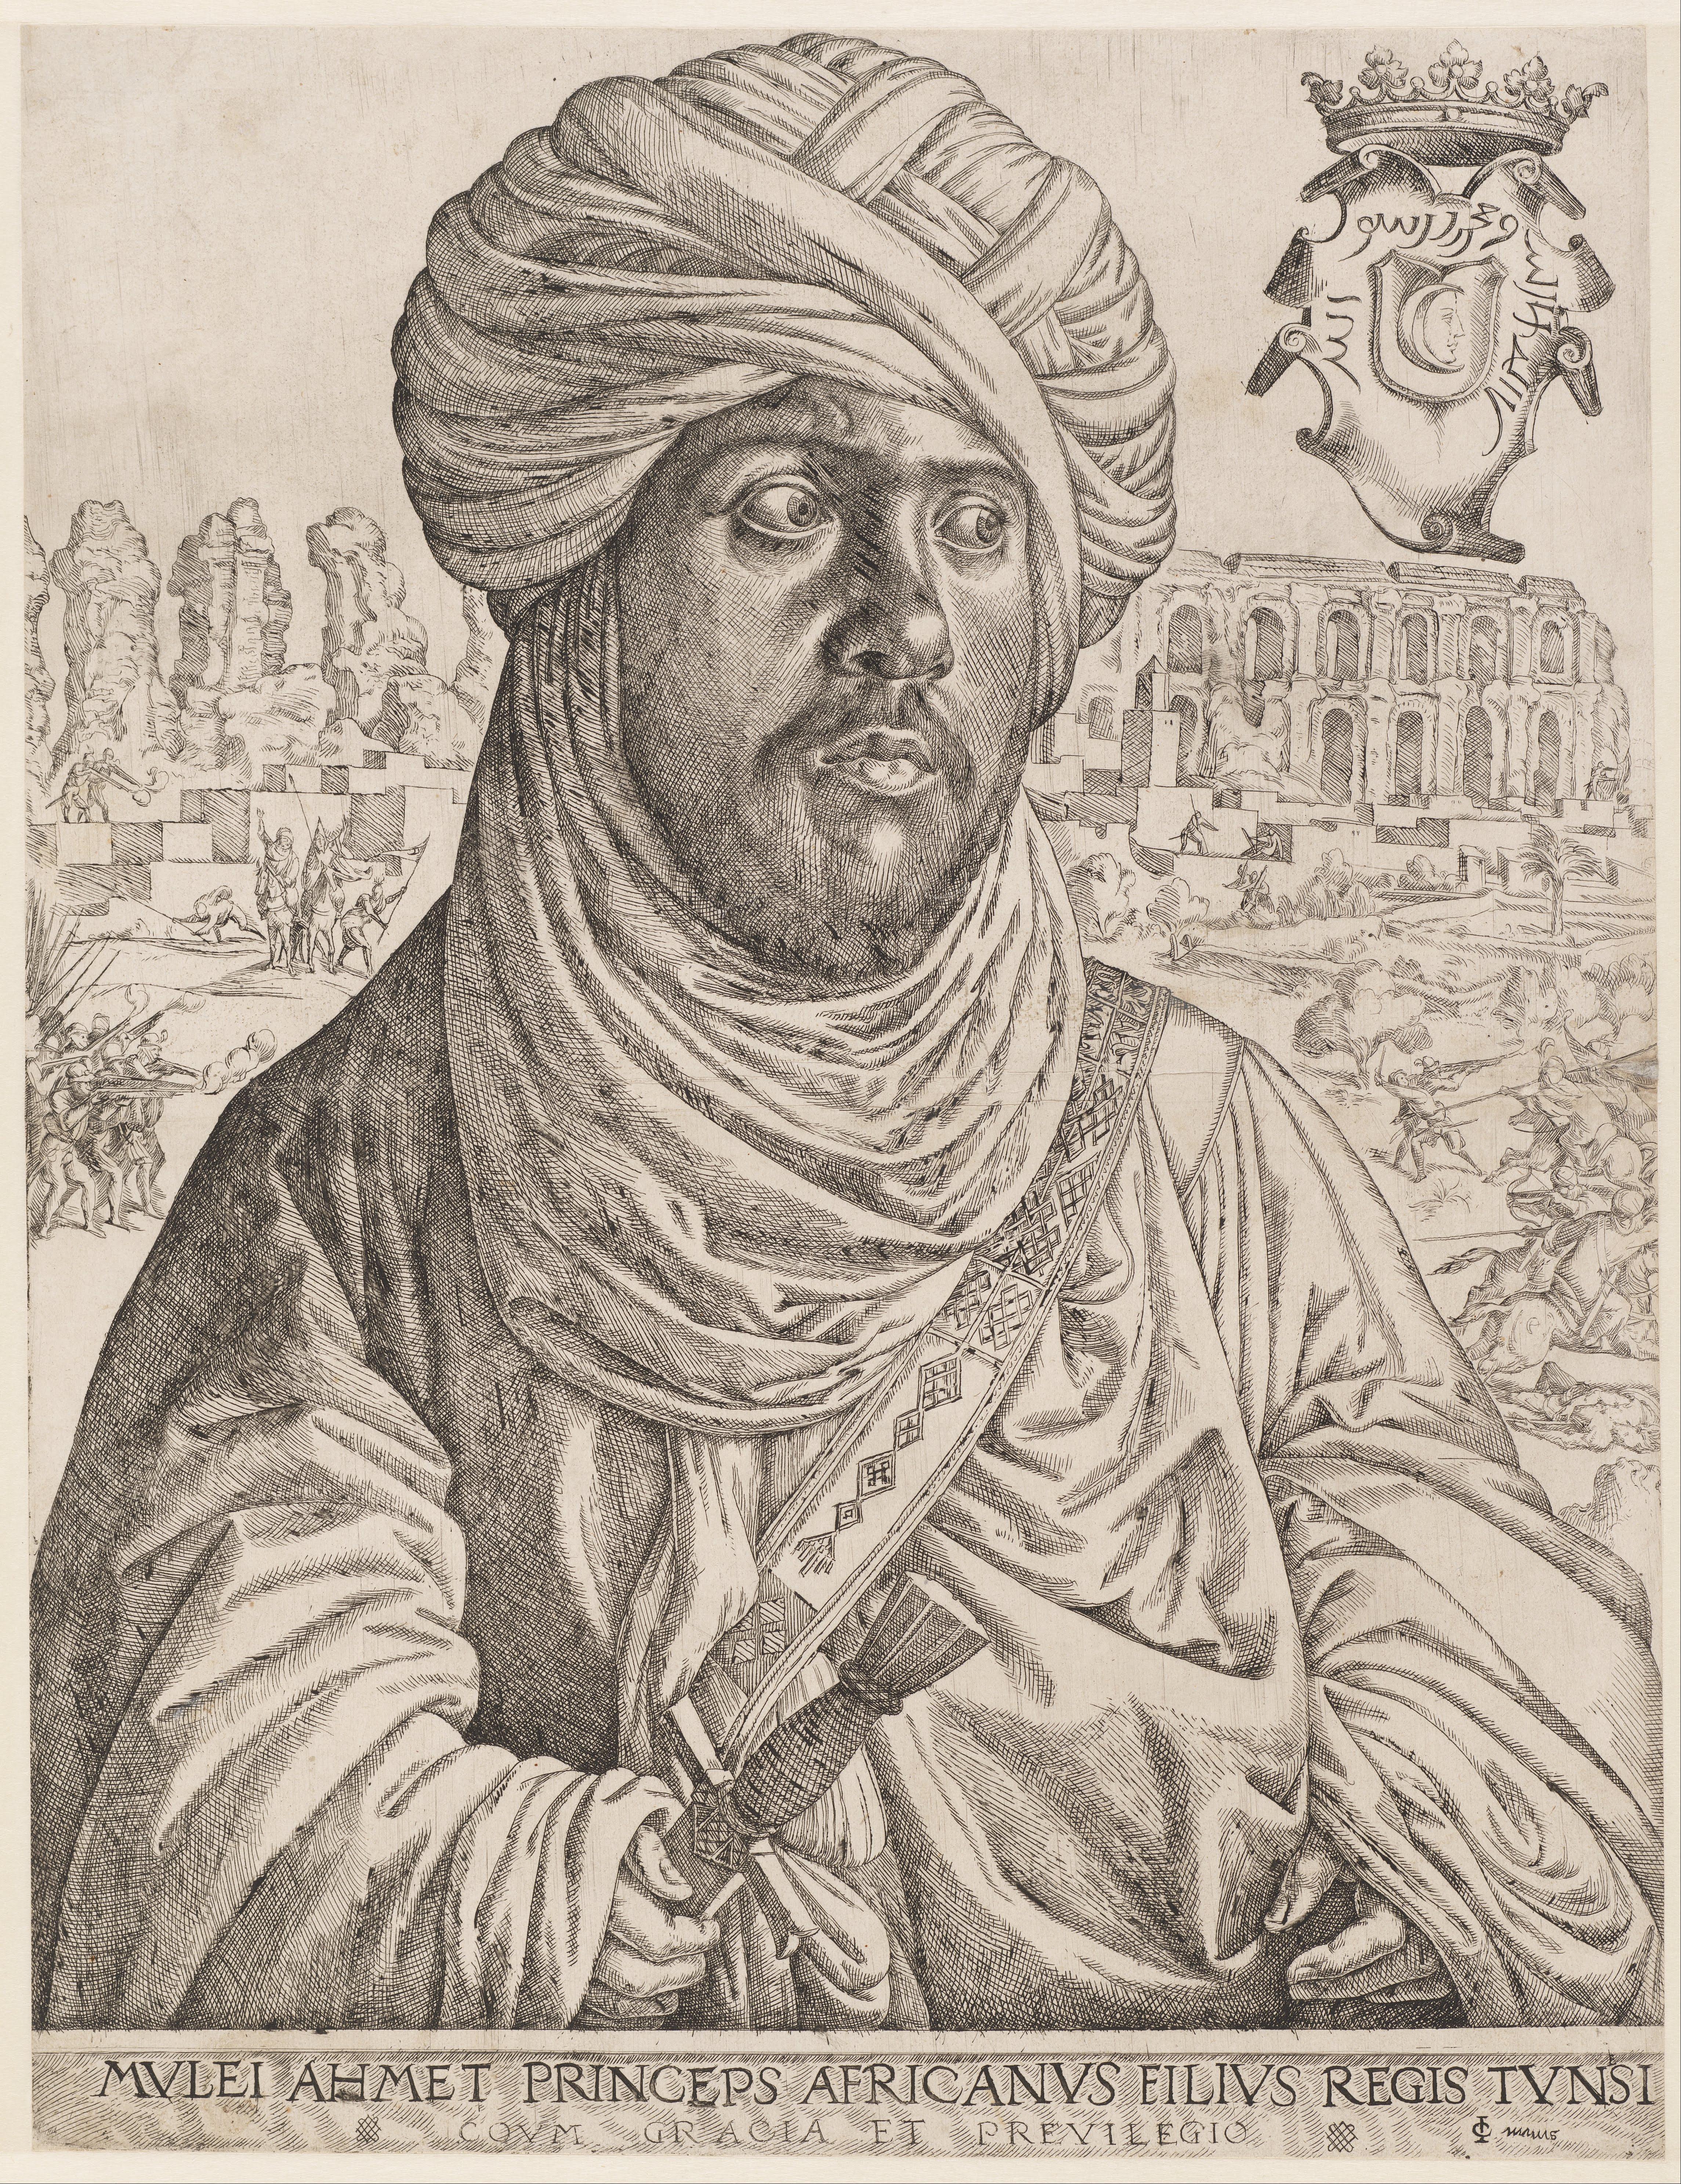 Le sultan Hafside Mulay Ahmad de Tunis